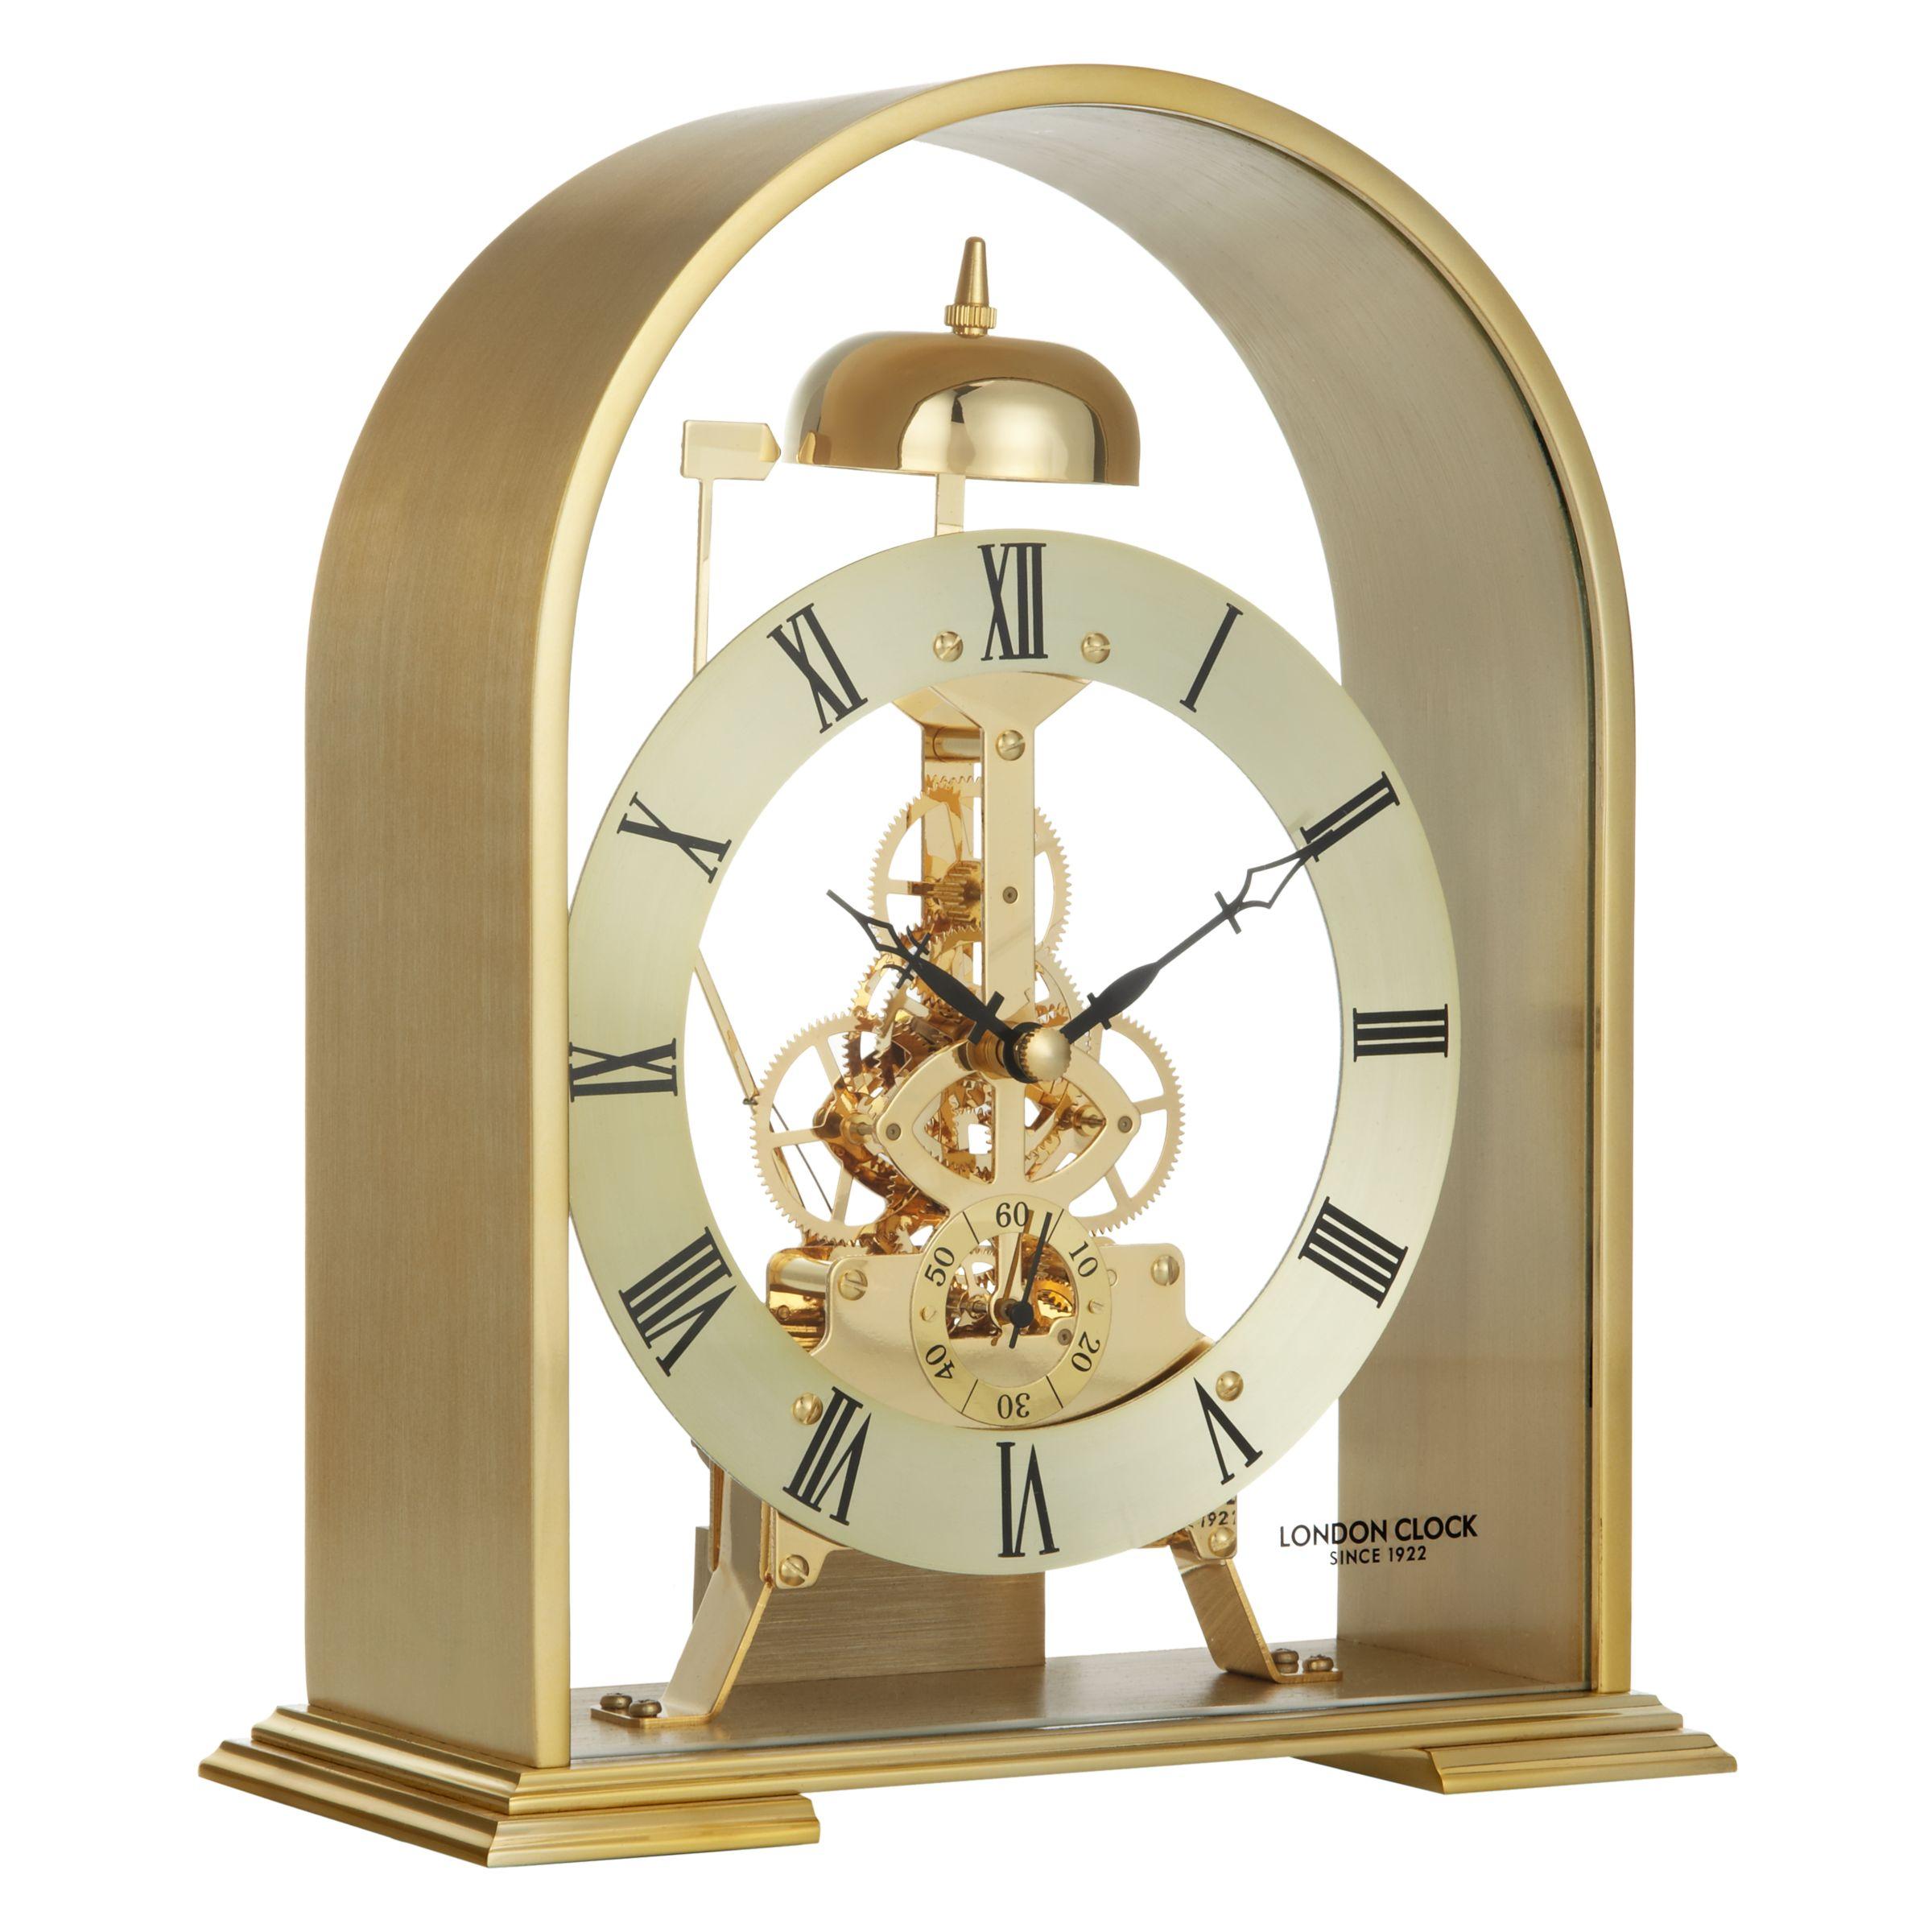 London Clock Company London Clock Company Arch Skeleton Mantel Clock, Gold